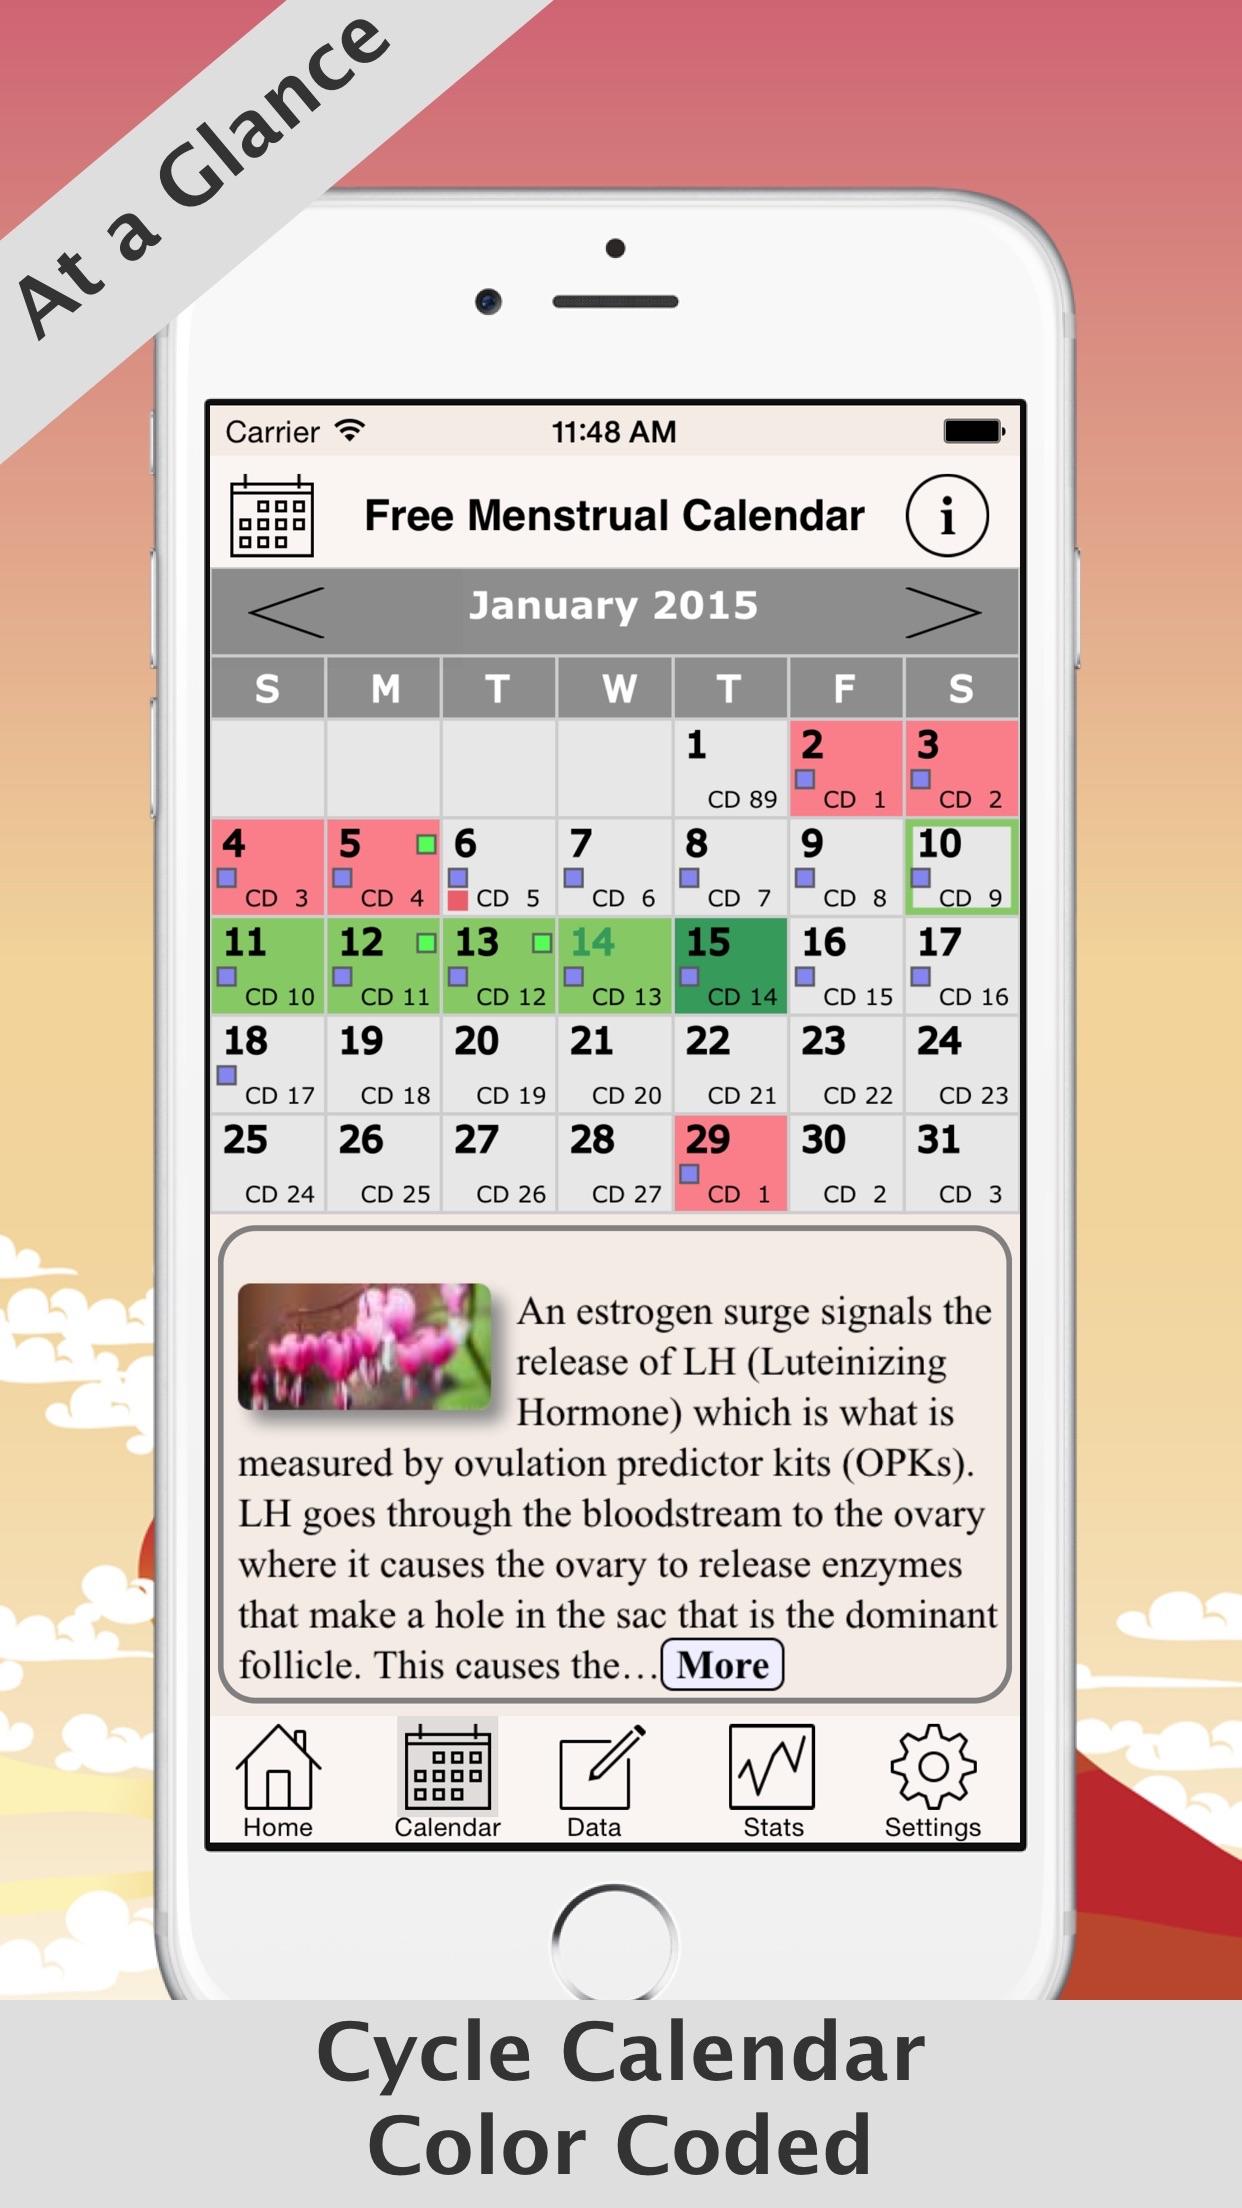 Free Menstrual Calendar For Periods and Ovulations Screenshot